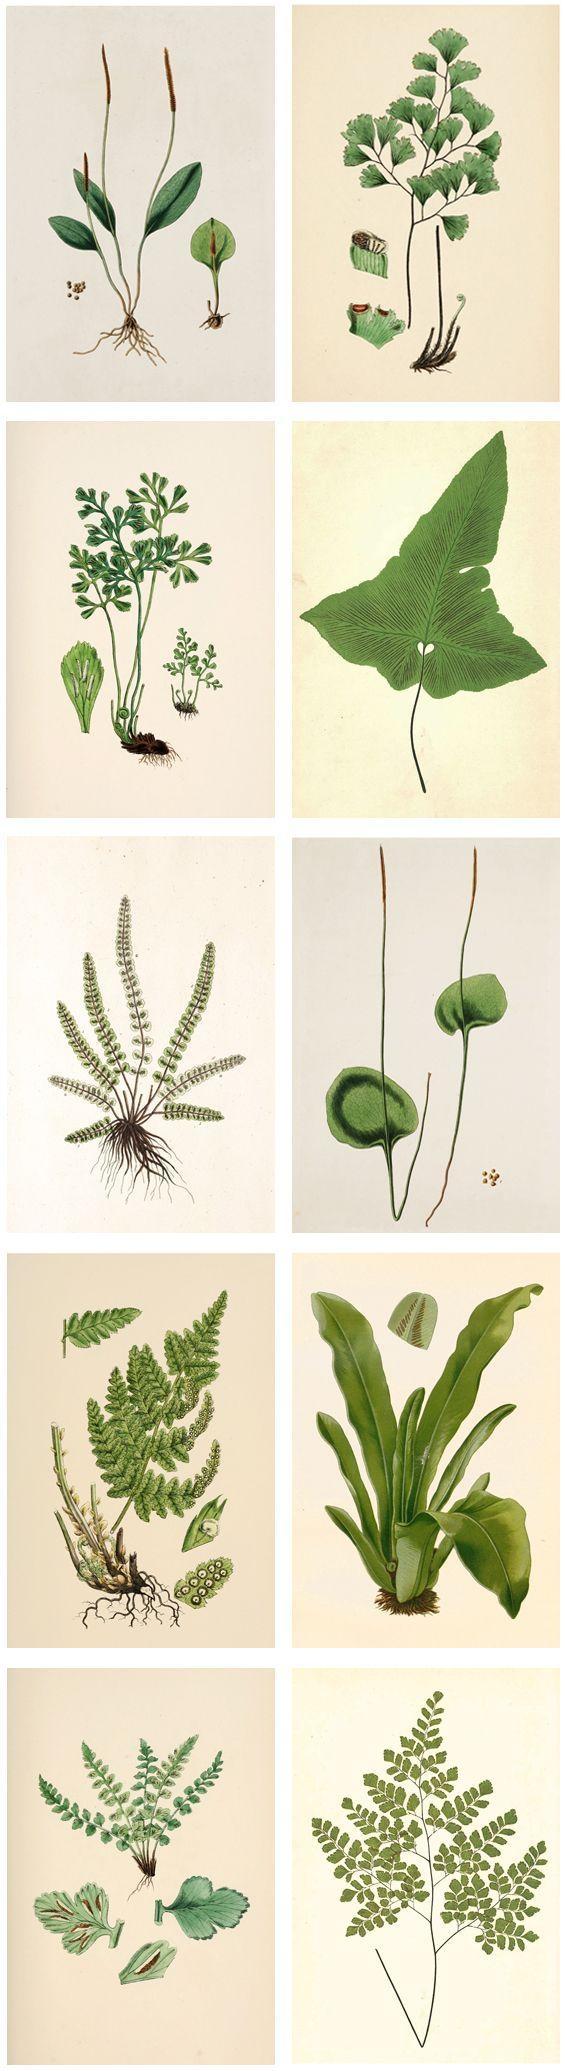 Best 25+ Plant Art Ideas On Pinterest | Kitchen Plants, Window Inside Floral & Plant Wall Art (View 4 of 20)